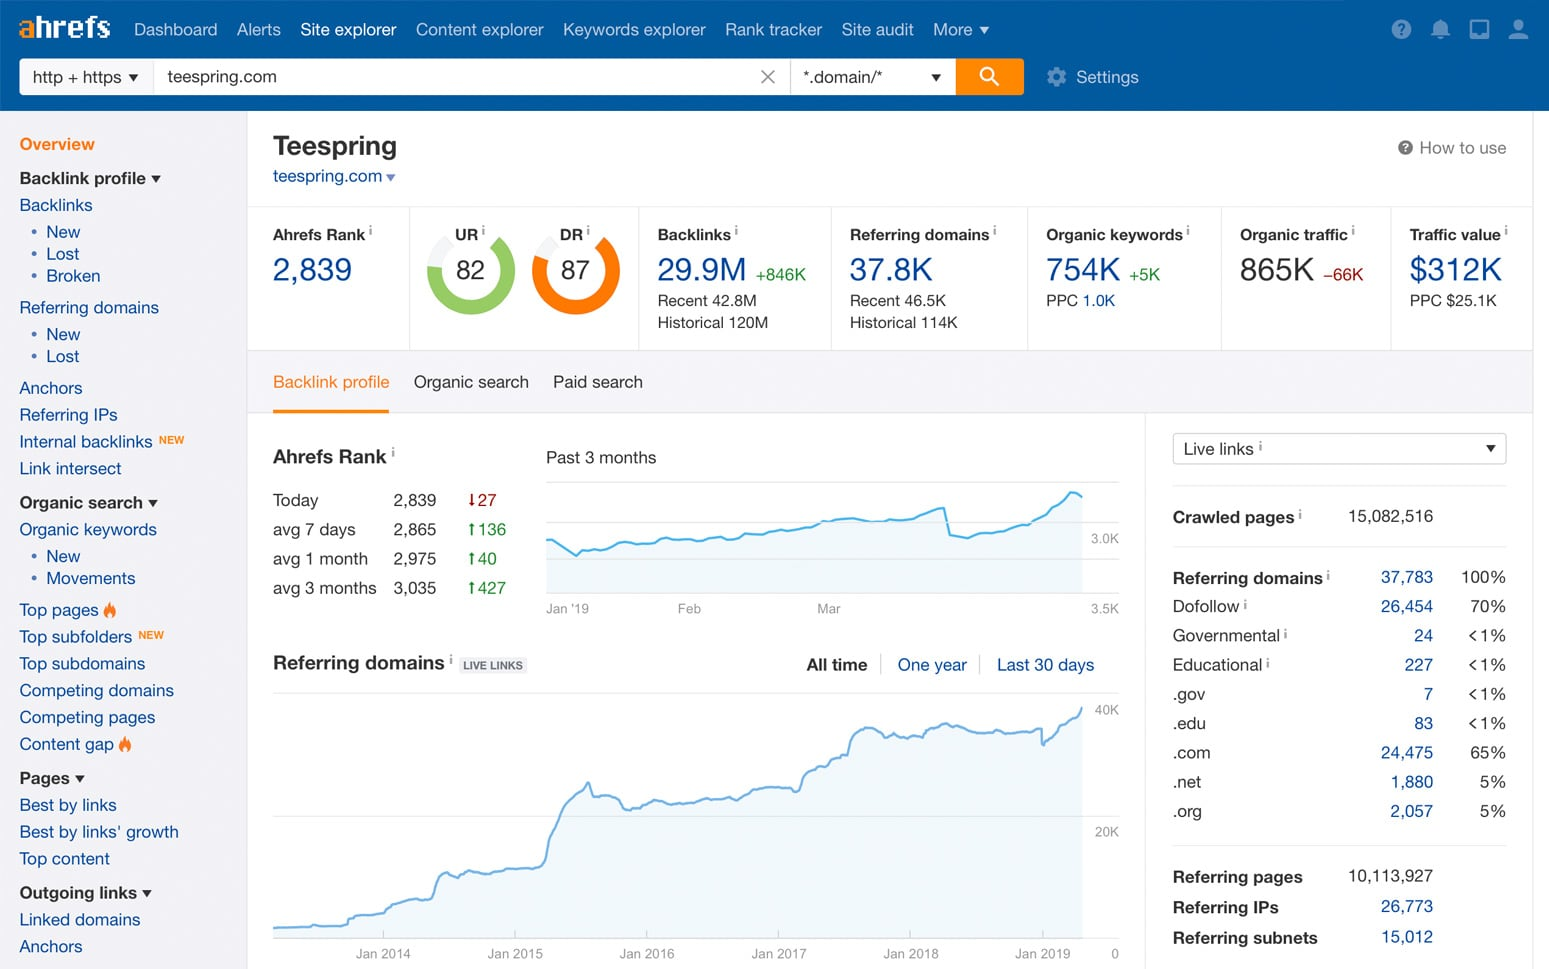 Search Engine Optimisation tools - Ahrefs